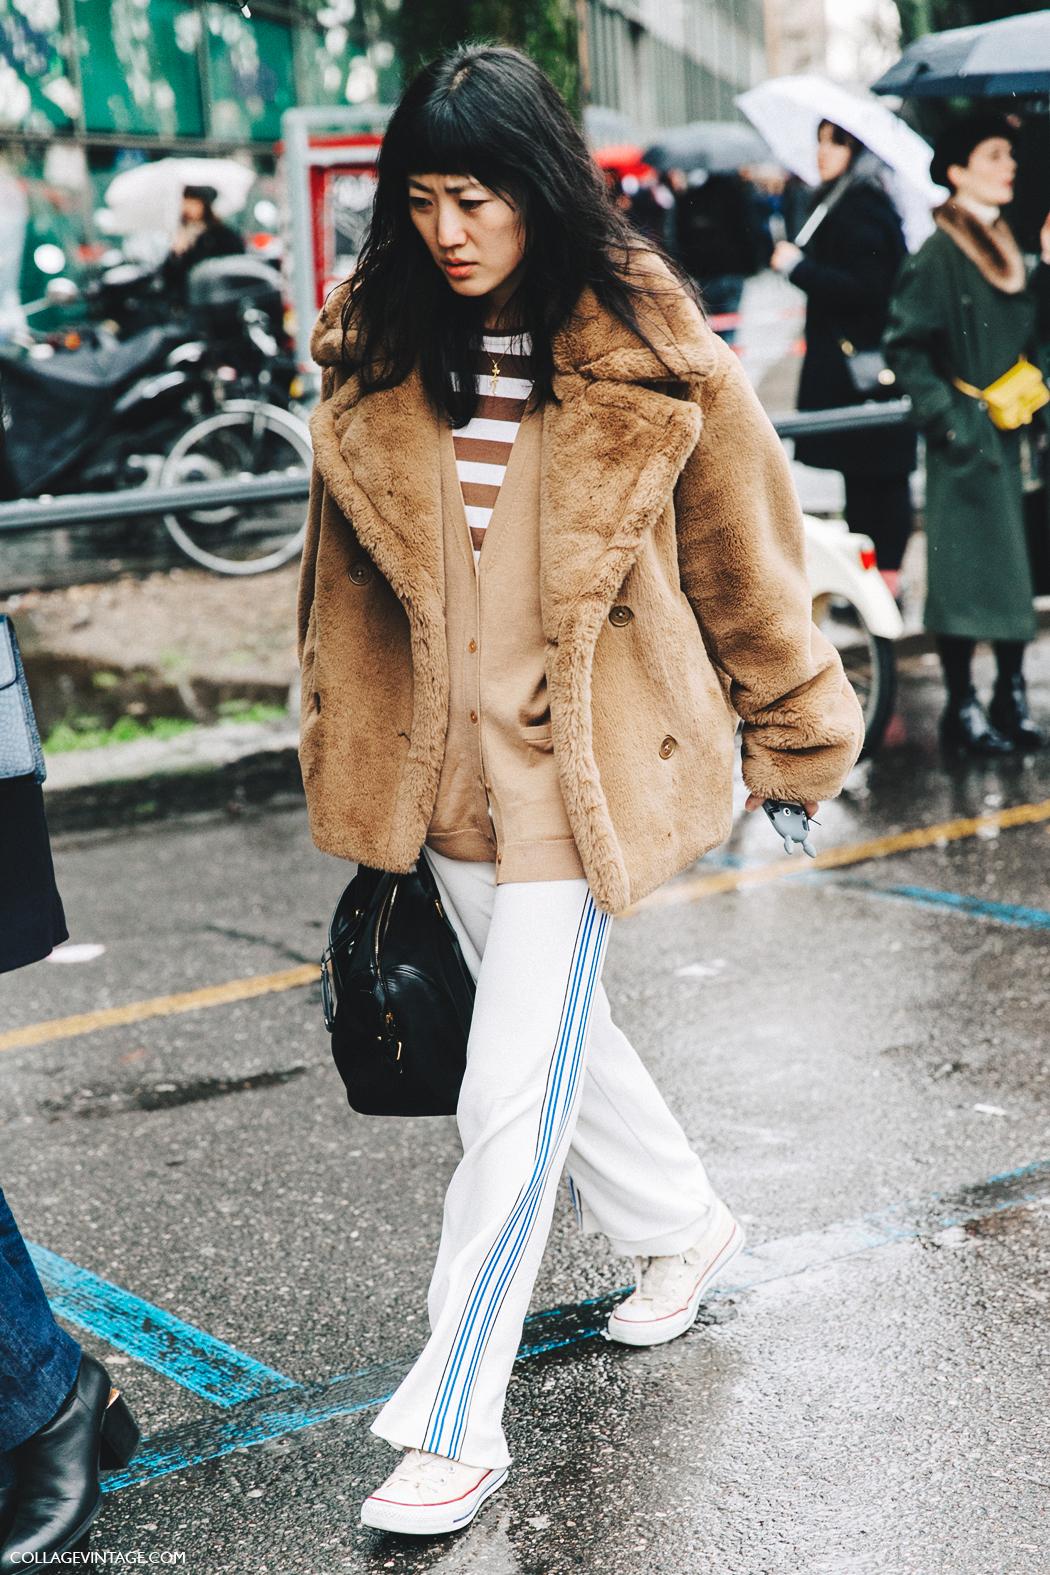 Milan_Fashion_Week_Fall_16-MFW-Street_Style-Collage_Vintage-Fur_Coat_Striped_Top-1